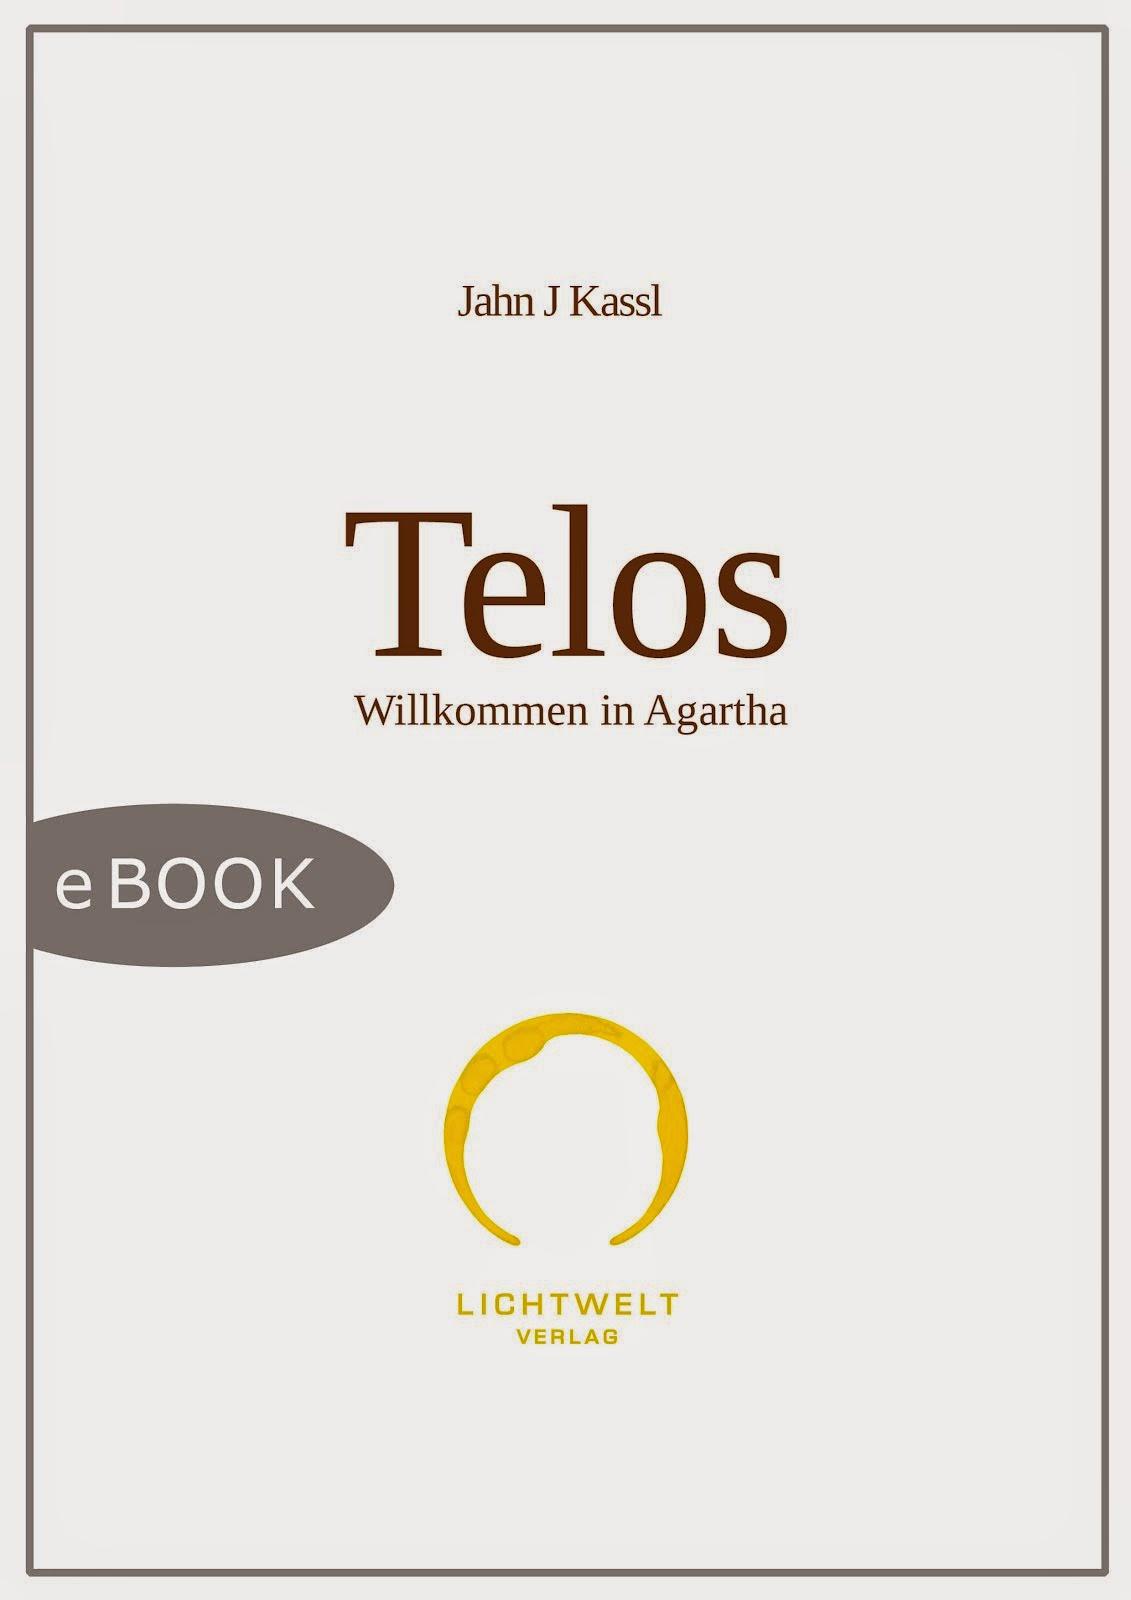 TELOS - Willkommen in Agartha - JJK (digitale Ausgabe)